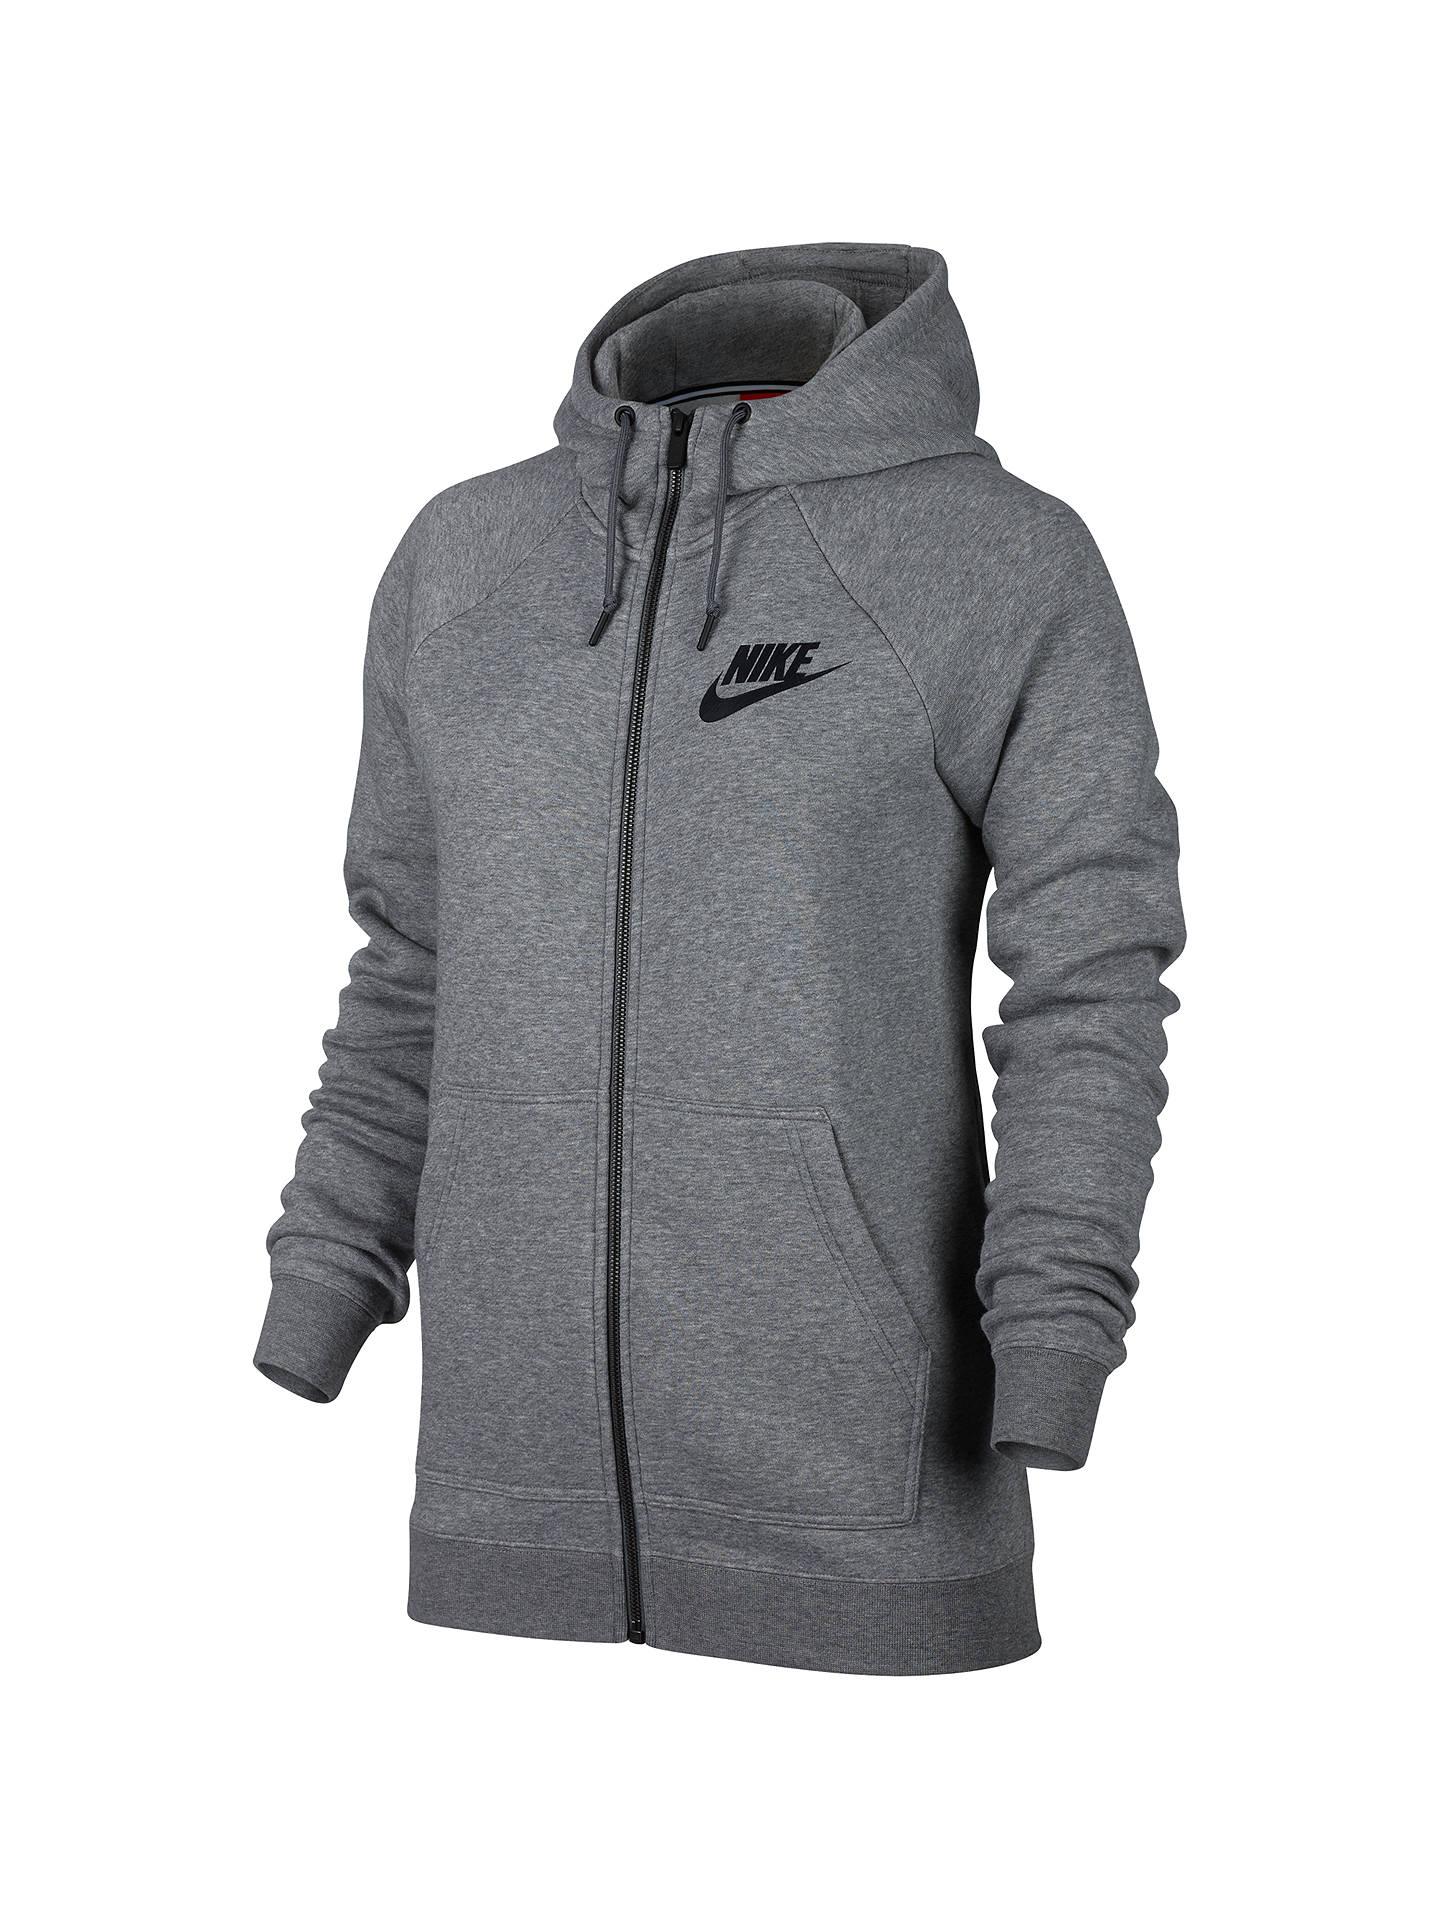 66babdb112a5 Nike Sportswear Full Zip Rally Hoodie at John Lewis   Partners